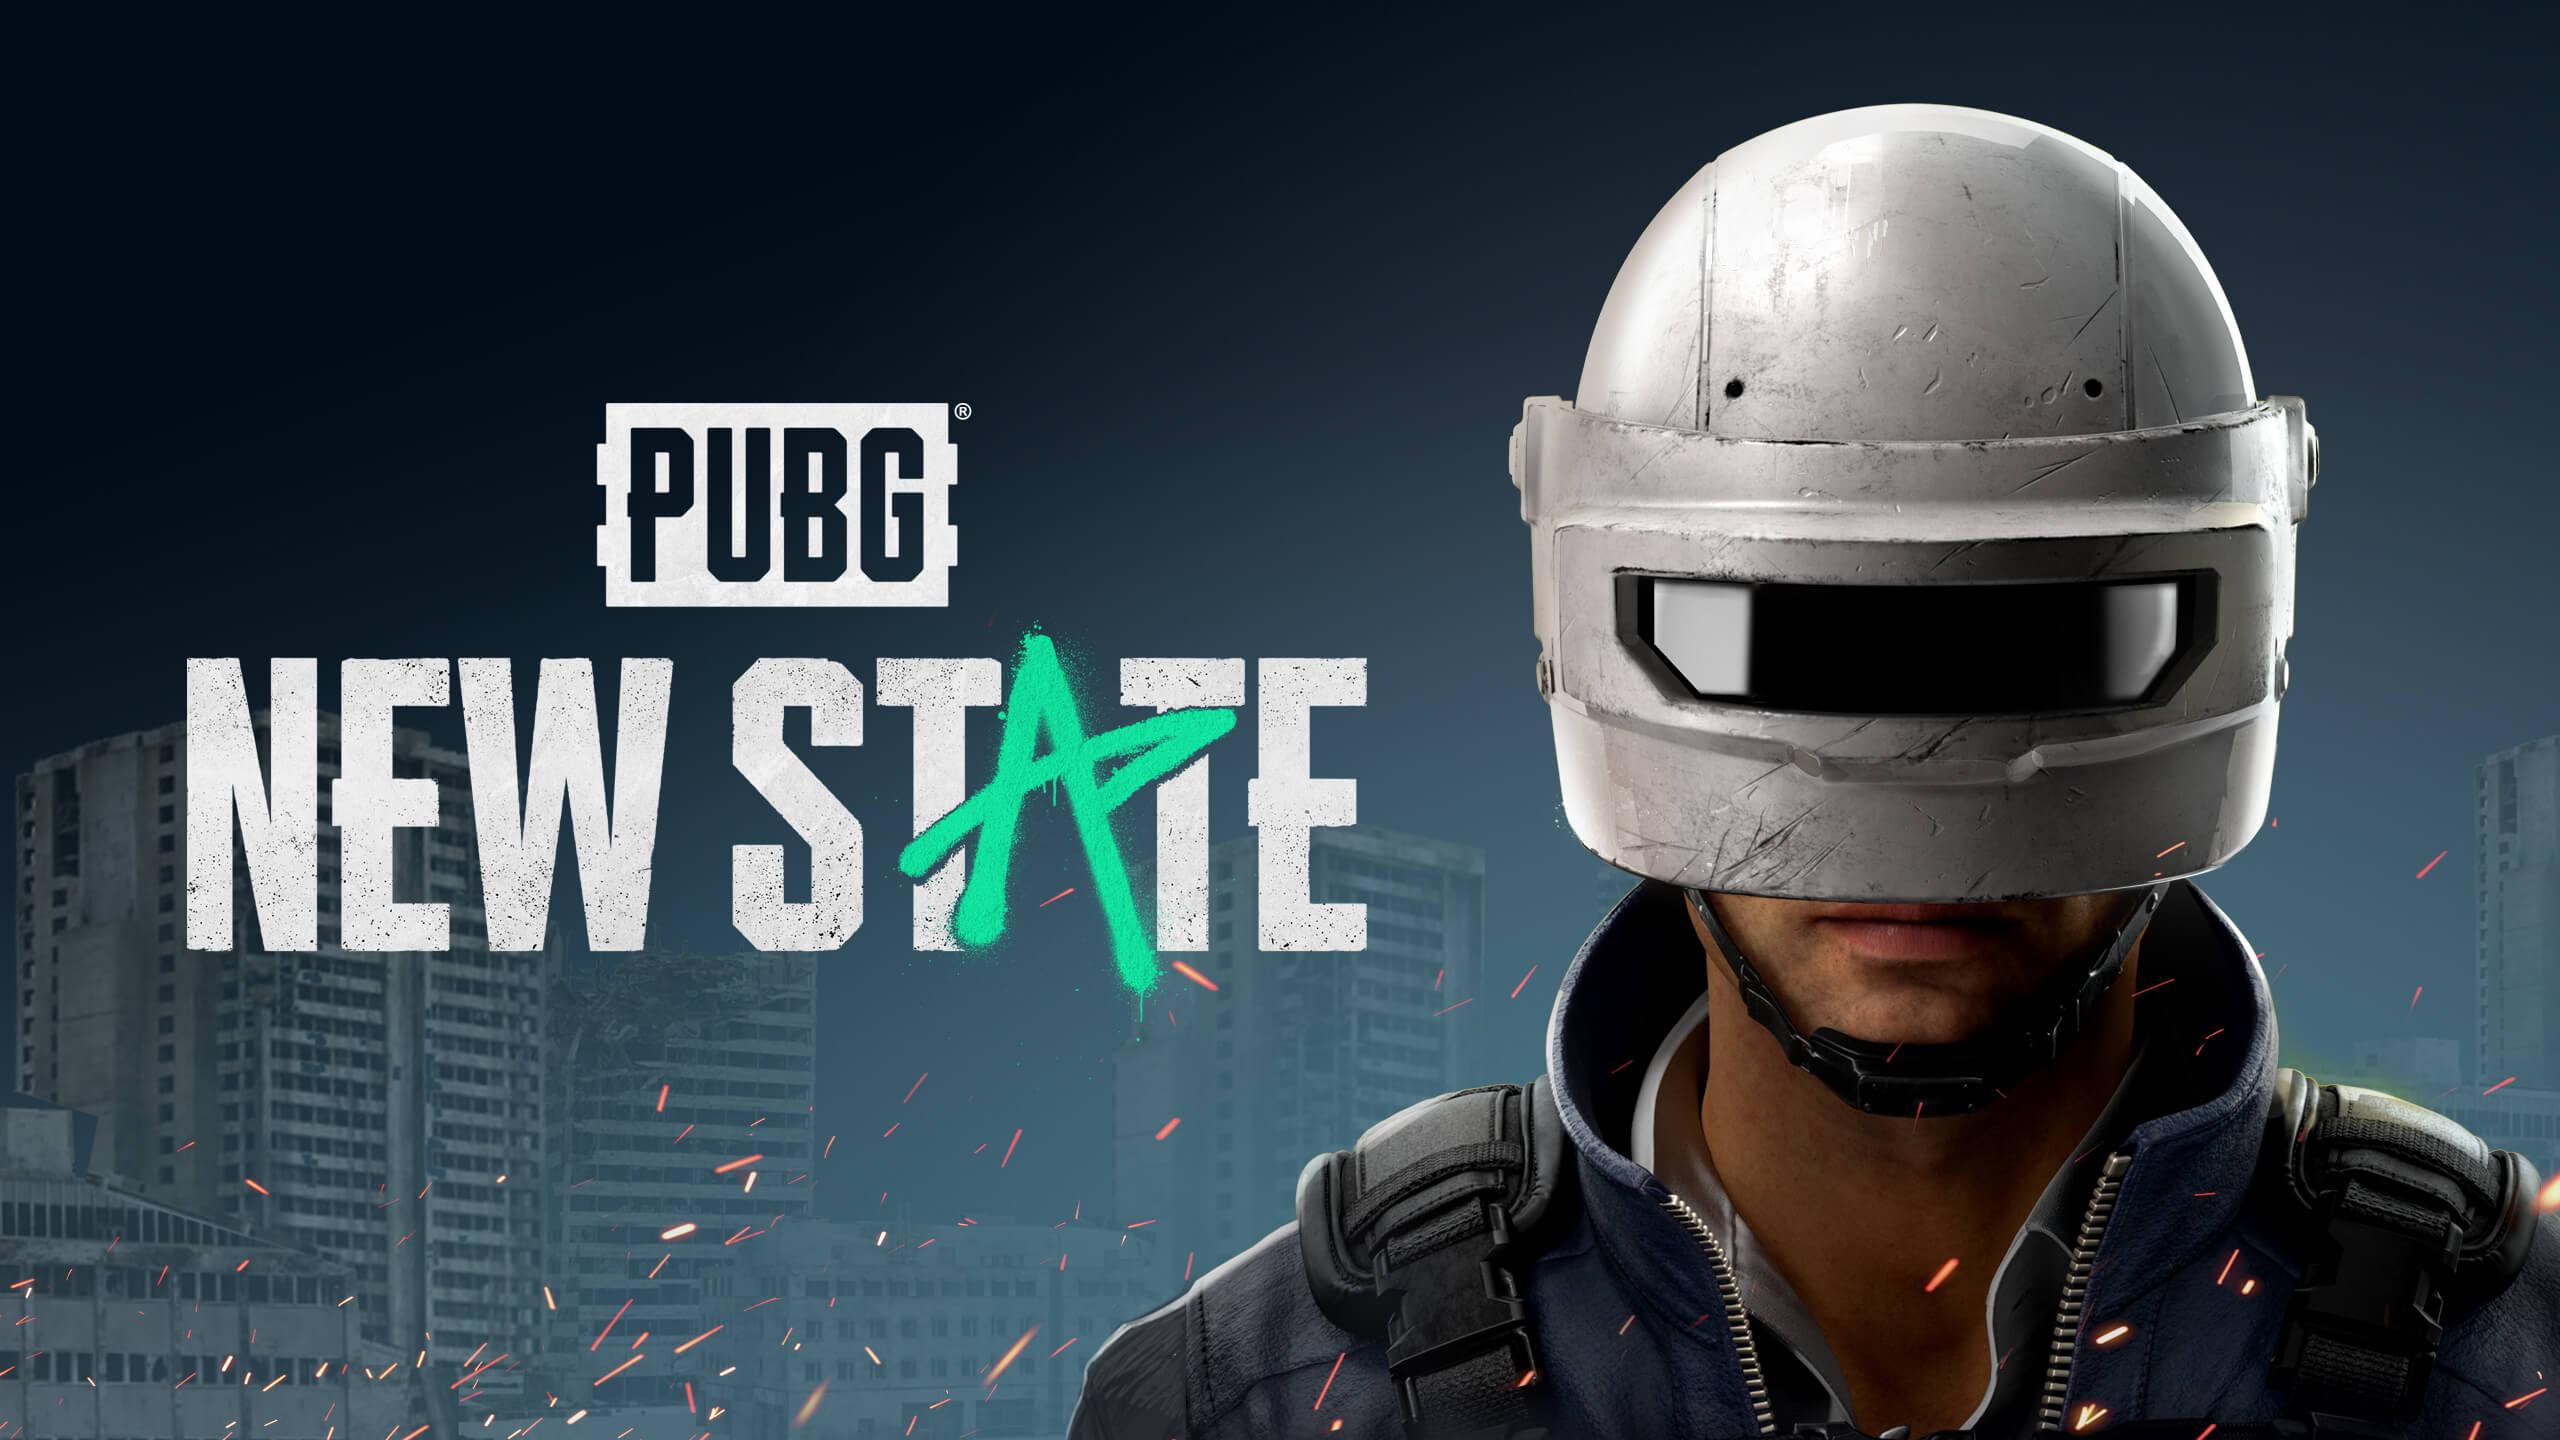 PUBG全新手游曝光,未来感的战术竞技 PUBG:NEW STATE